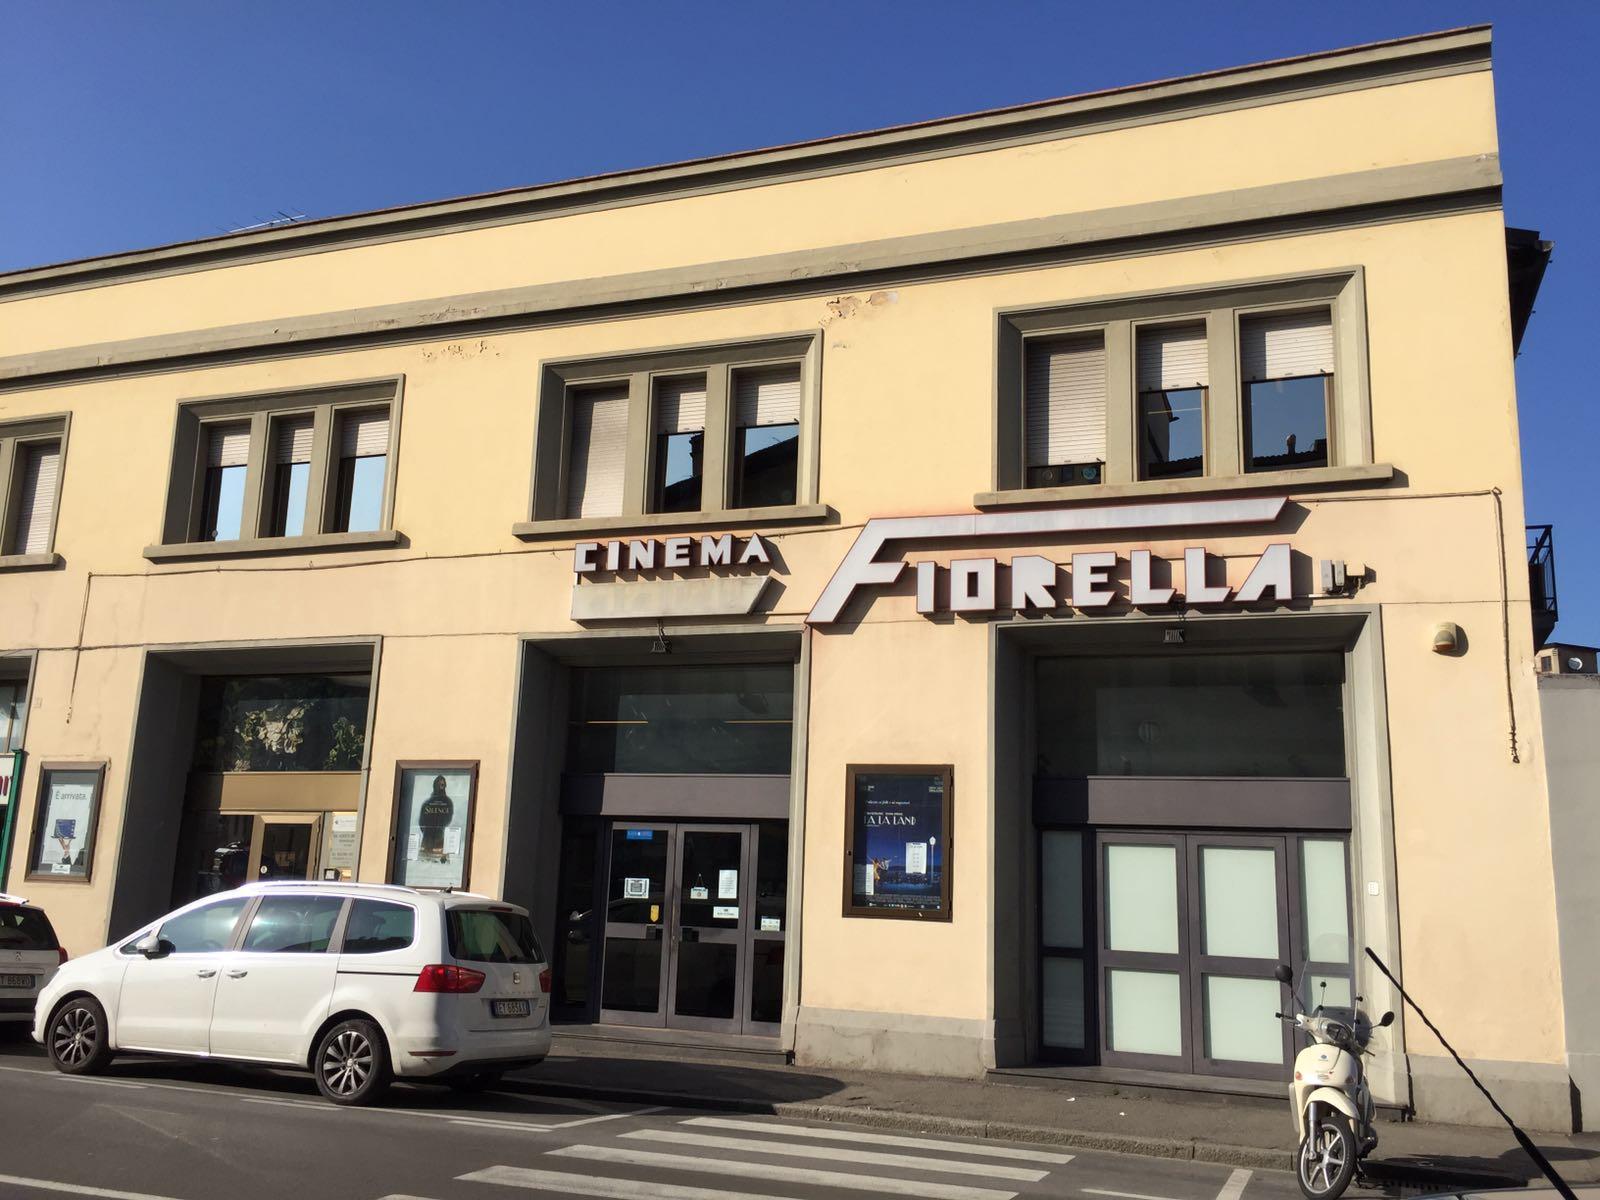 Circuito Cinemas : Cinema fiorella a firenze circuito